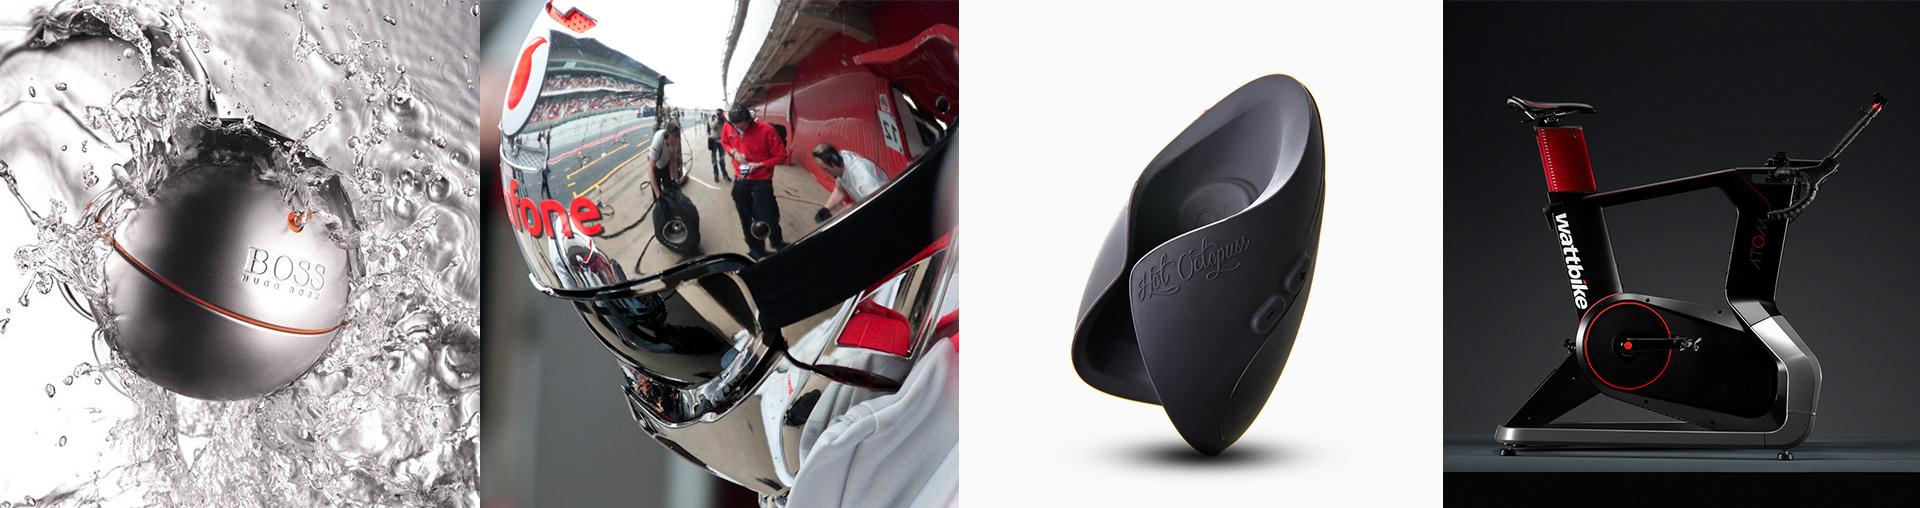 Curventa - product design - Hugo Boss - boss in motion - Ruroc - RG1 - Vodafone - Formula 1 - pit lane - crew - Hotoctopuss - pulse - guybrator - sex toy - wattbike - atom - indoor trainer